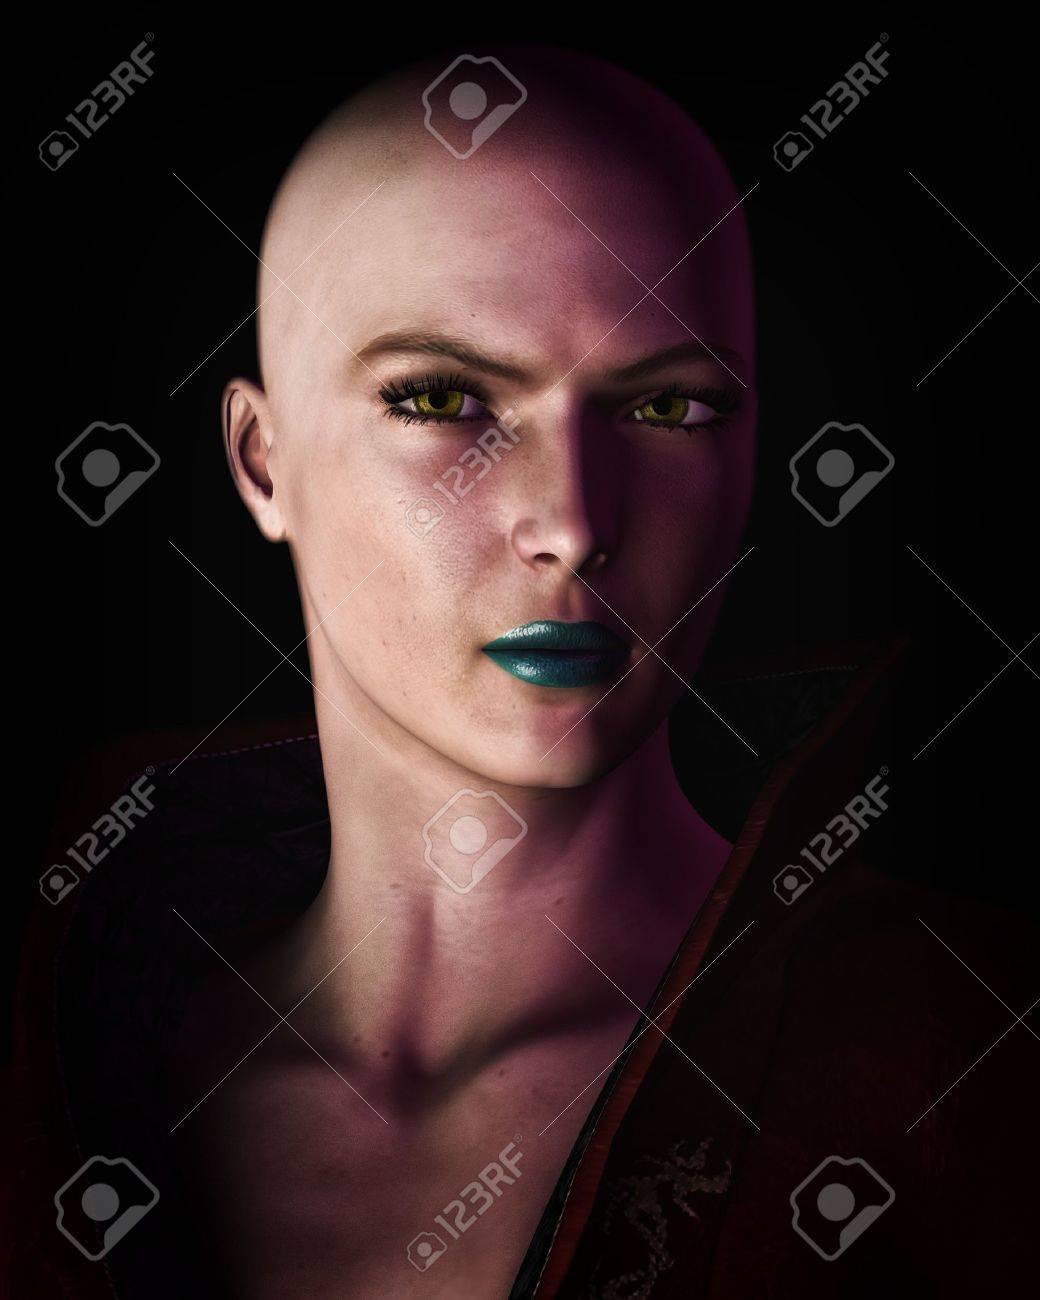 Digital illustration of a strong, futuristic sci-fi looking bald woman in heavy dark shadow. - 12474846